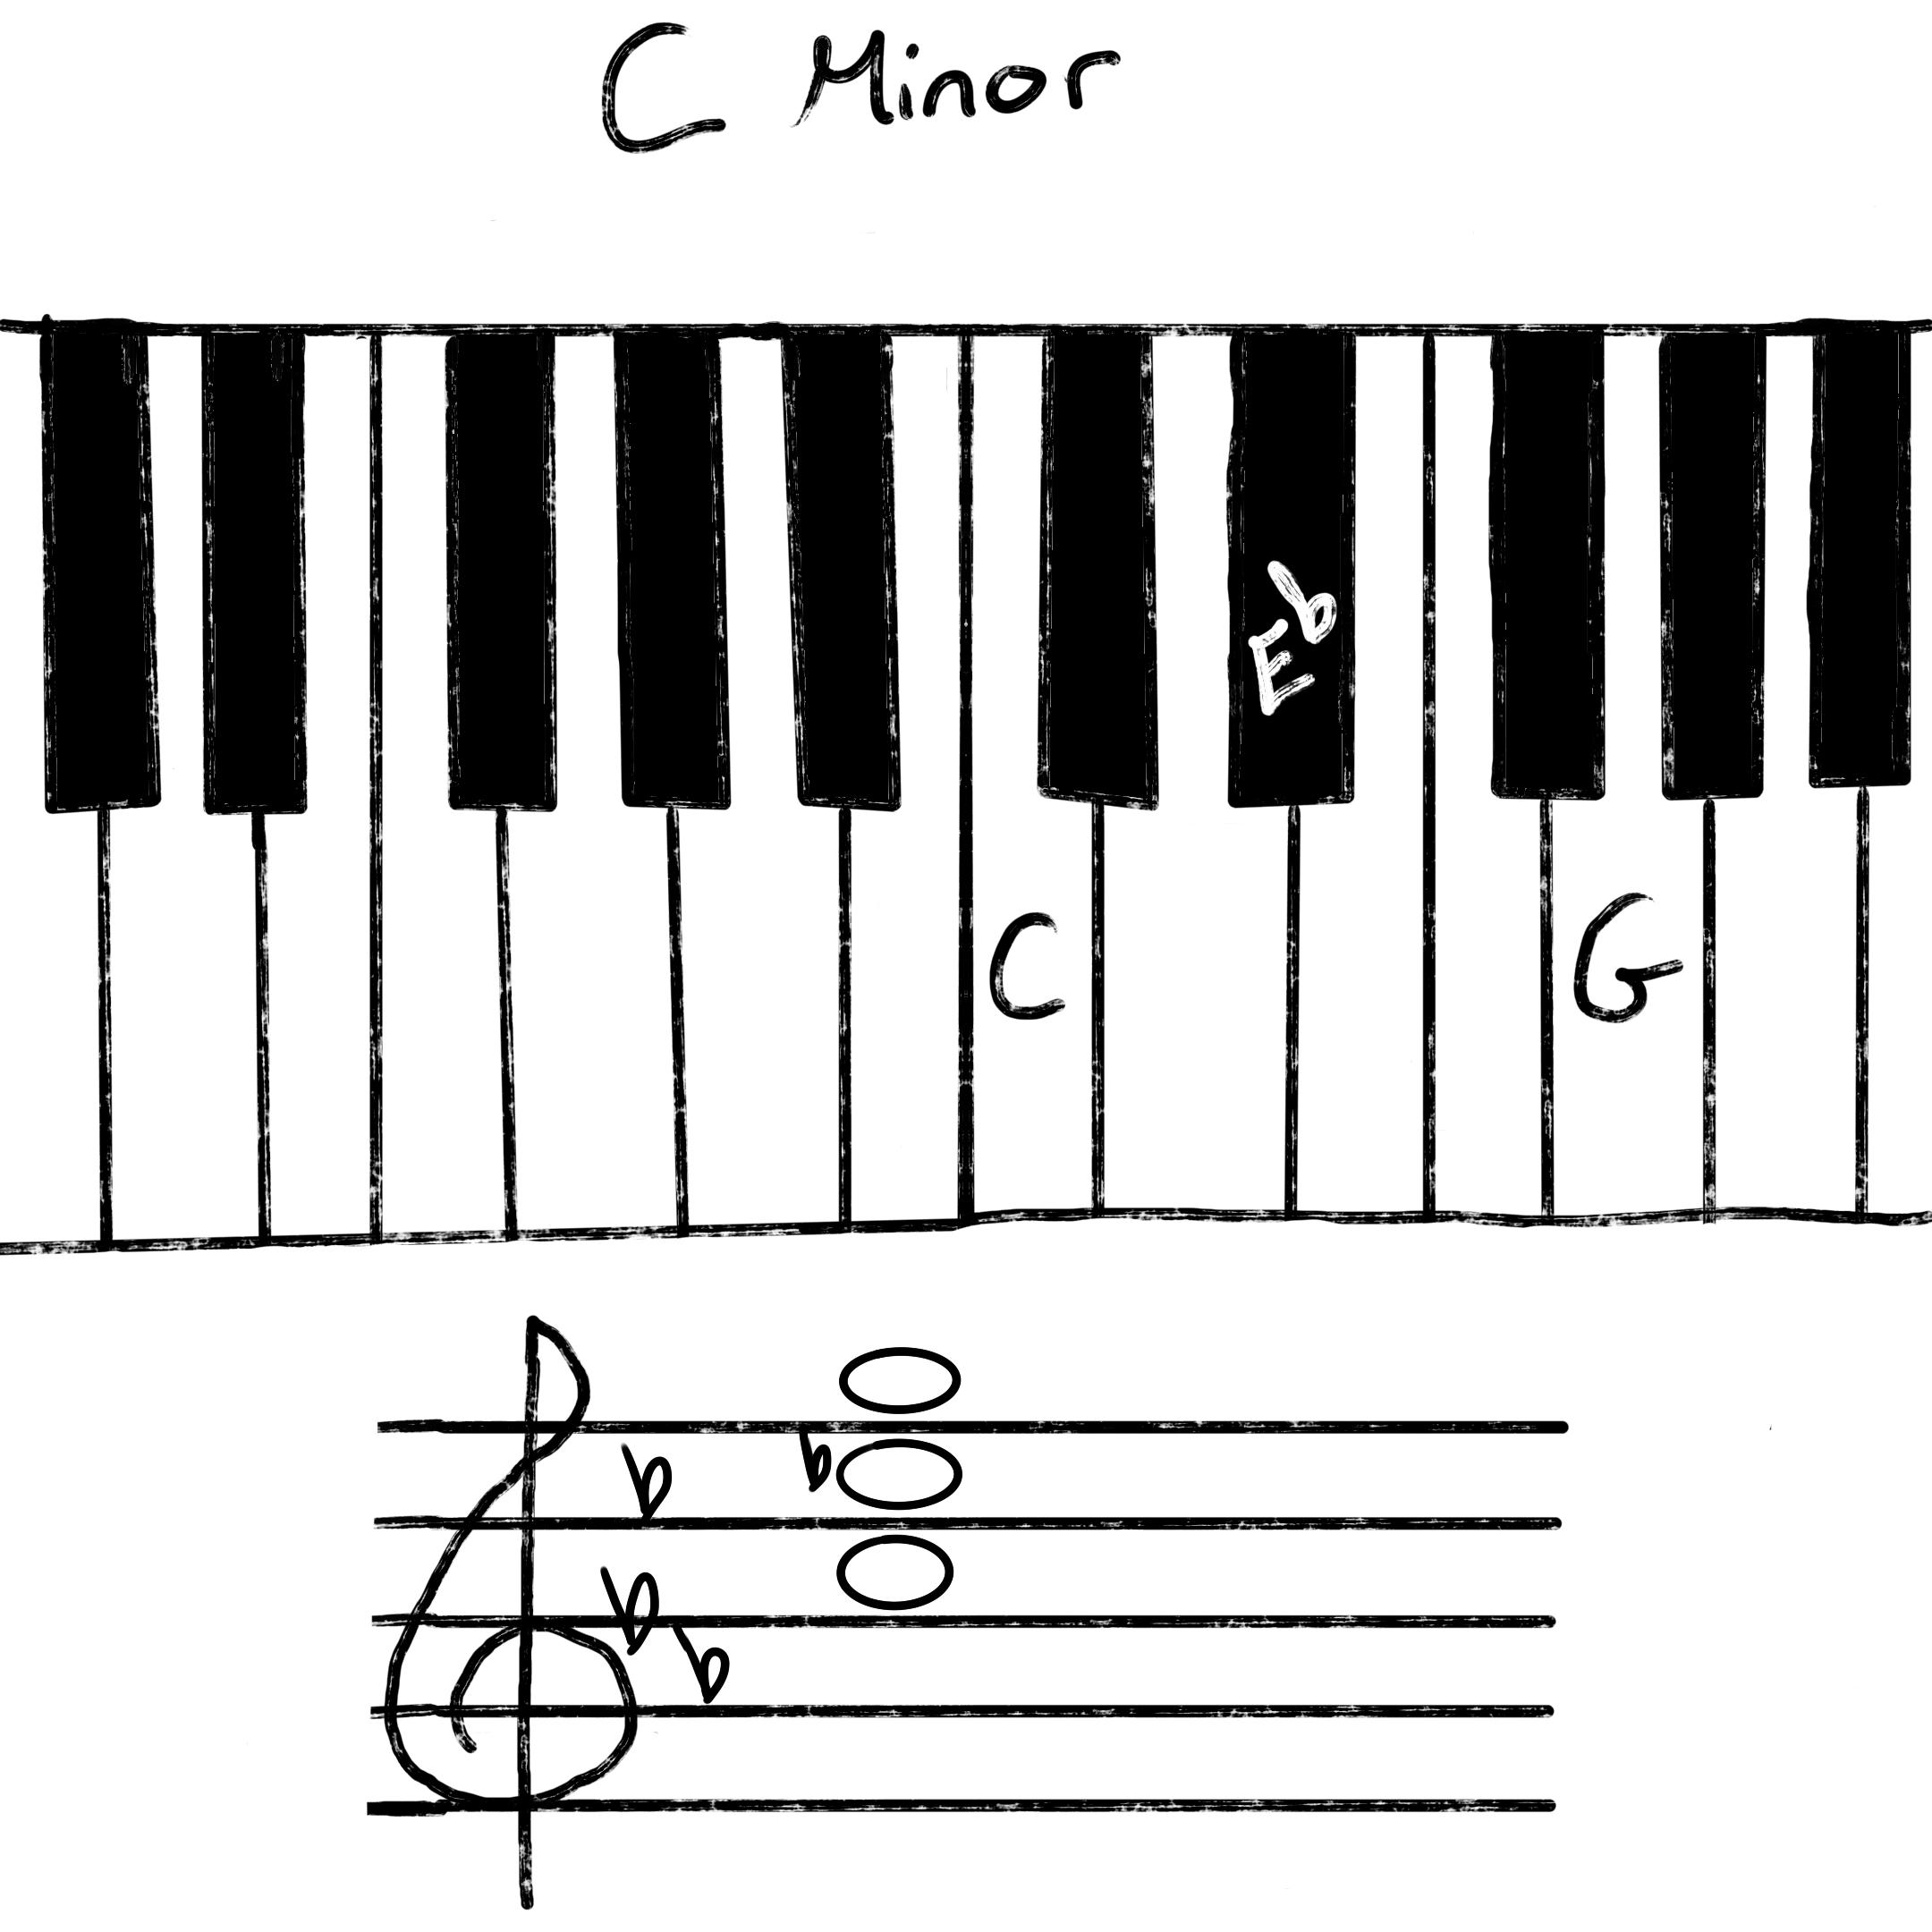 Cm minor